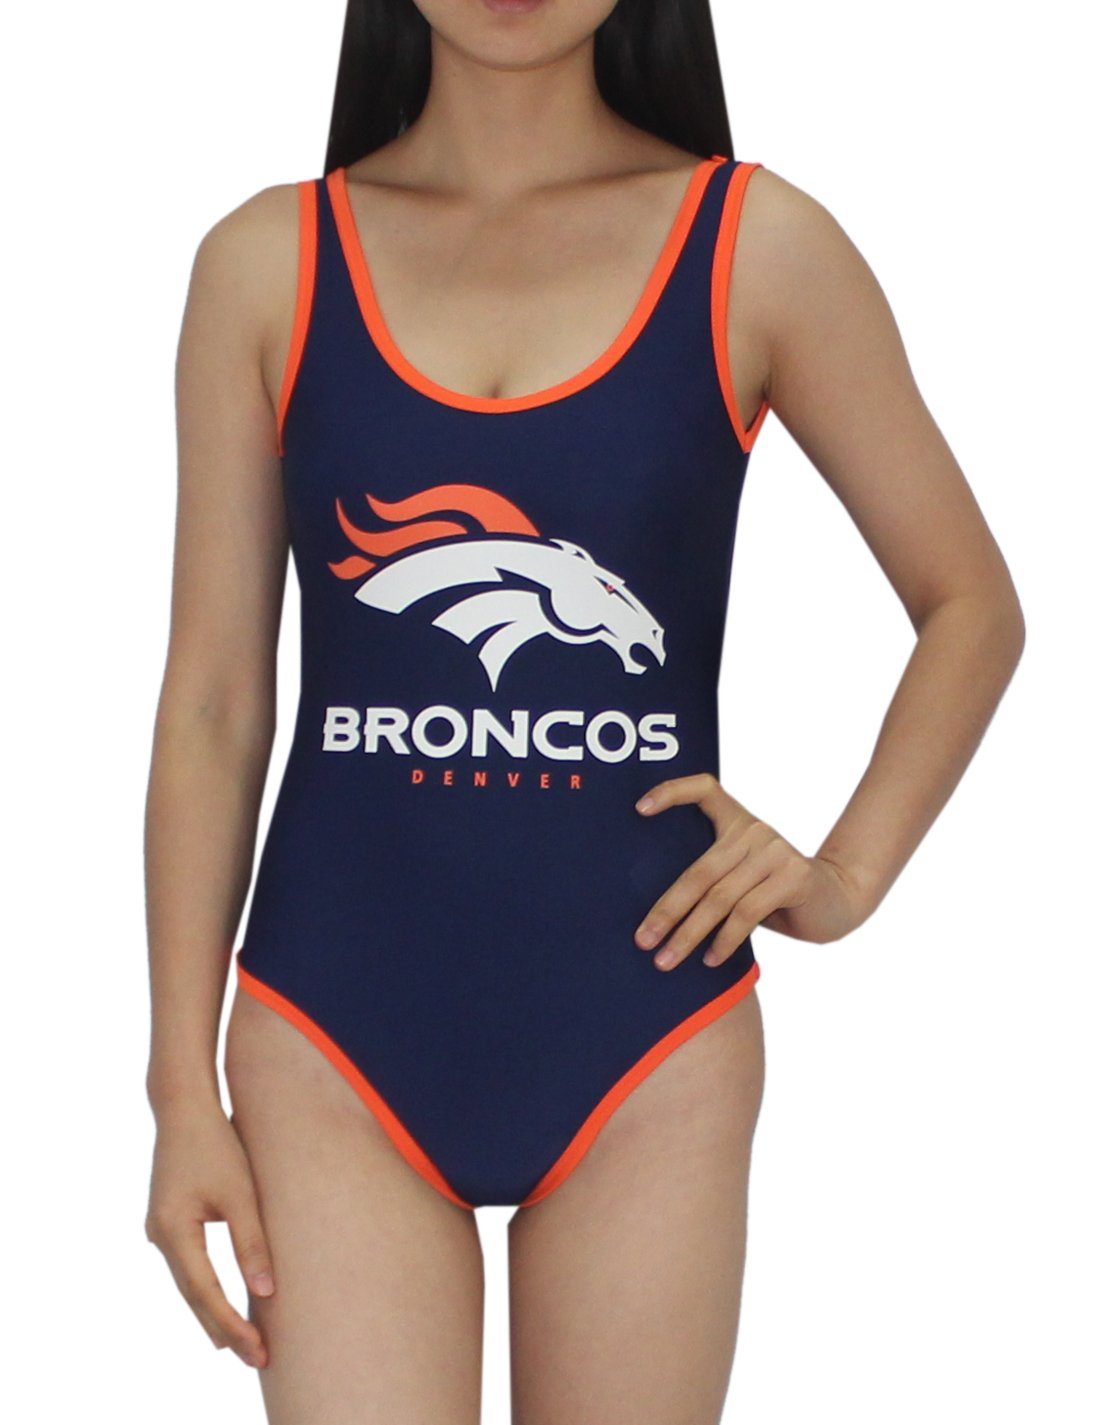 A-Team Apparel Denver Broncos Game Day One-Piece Sleeveless Bodysuit for Women M Dark Blue